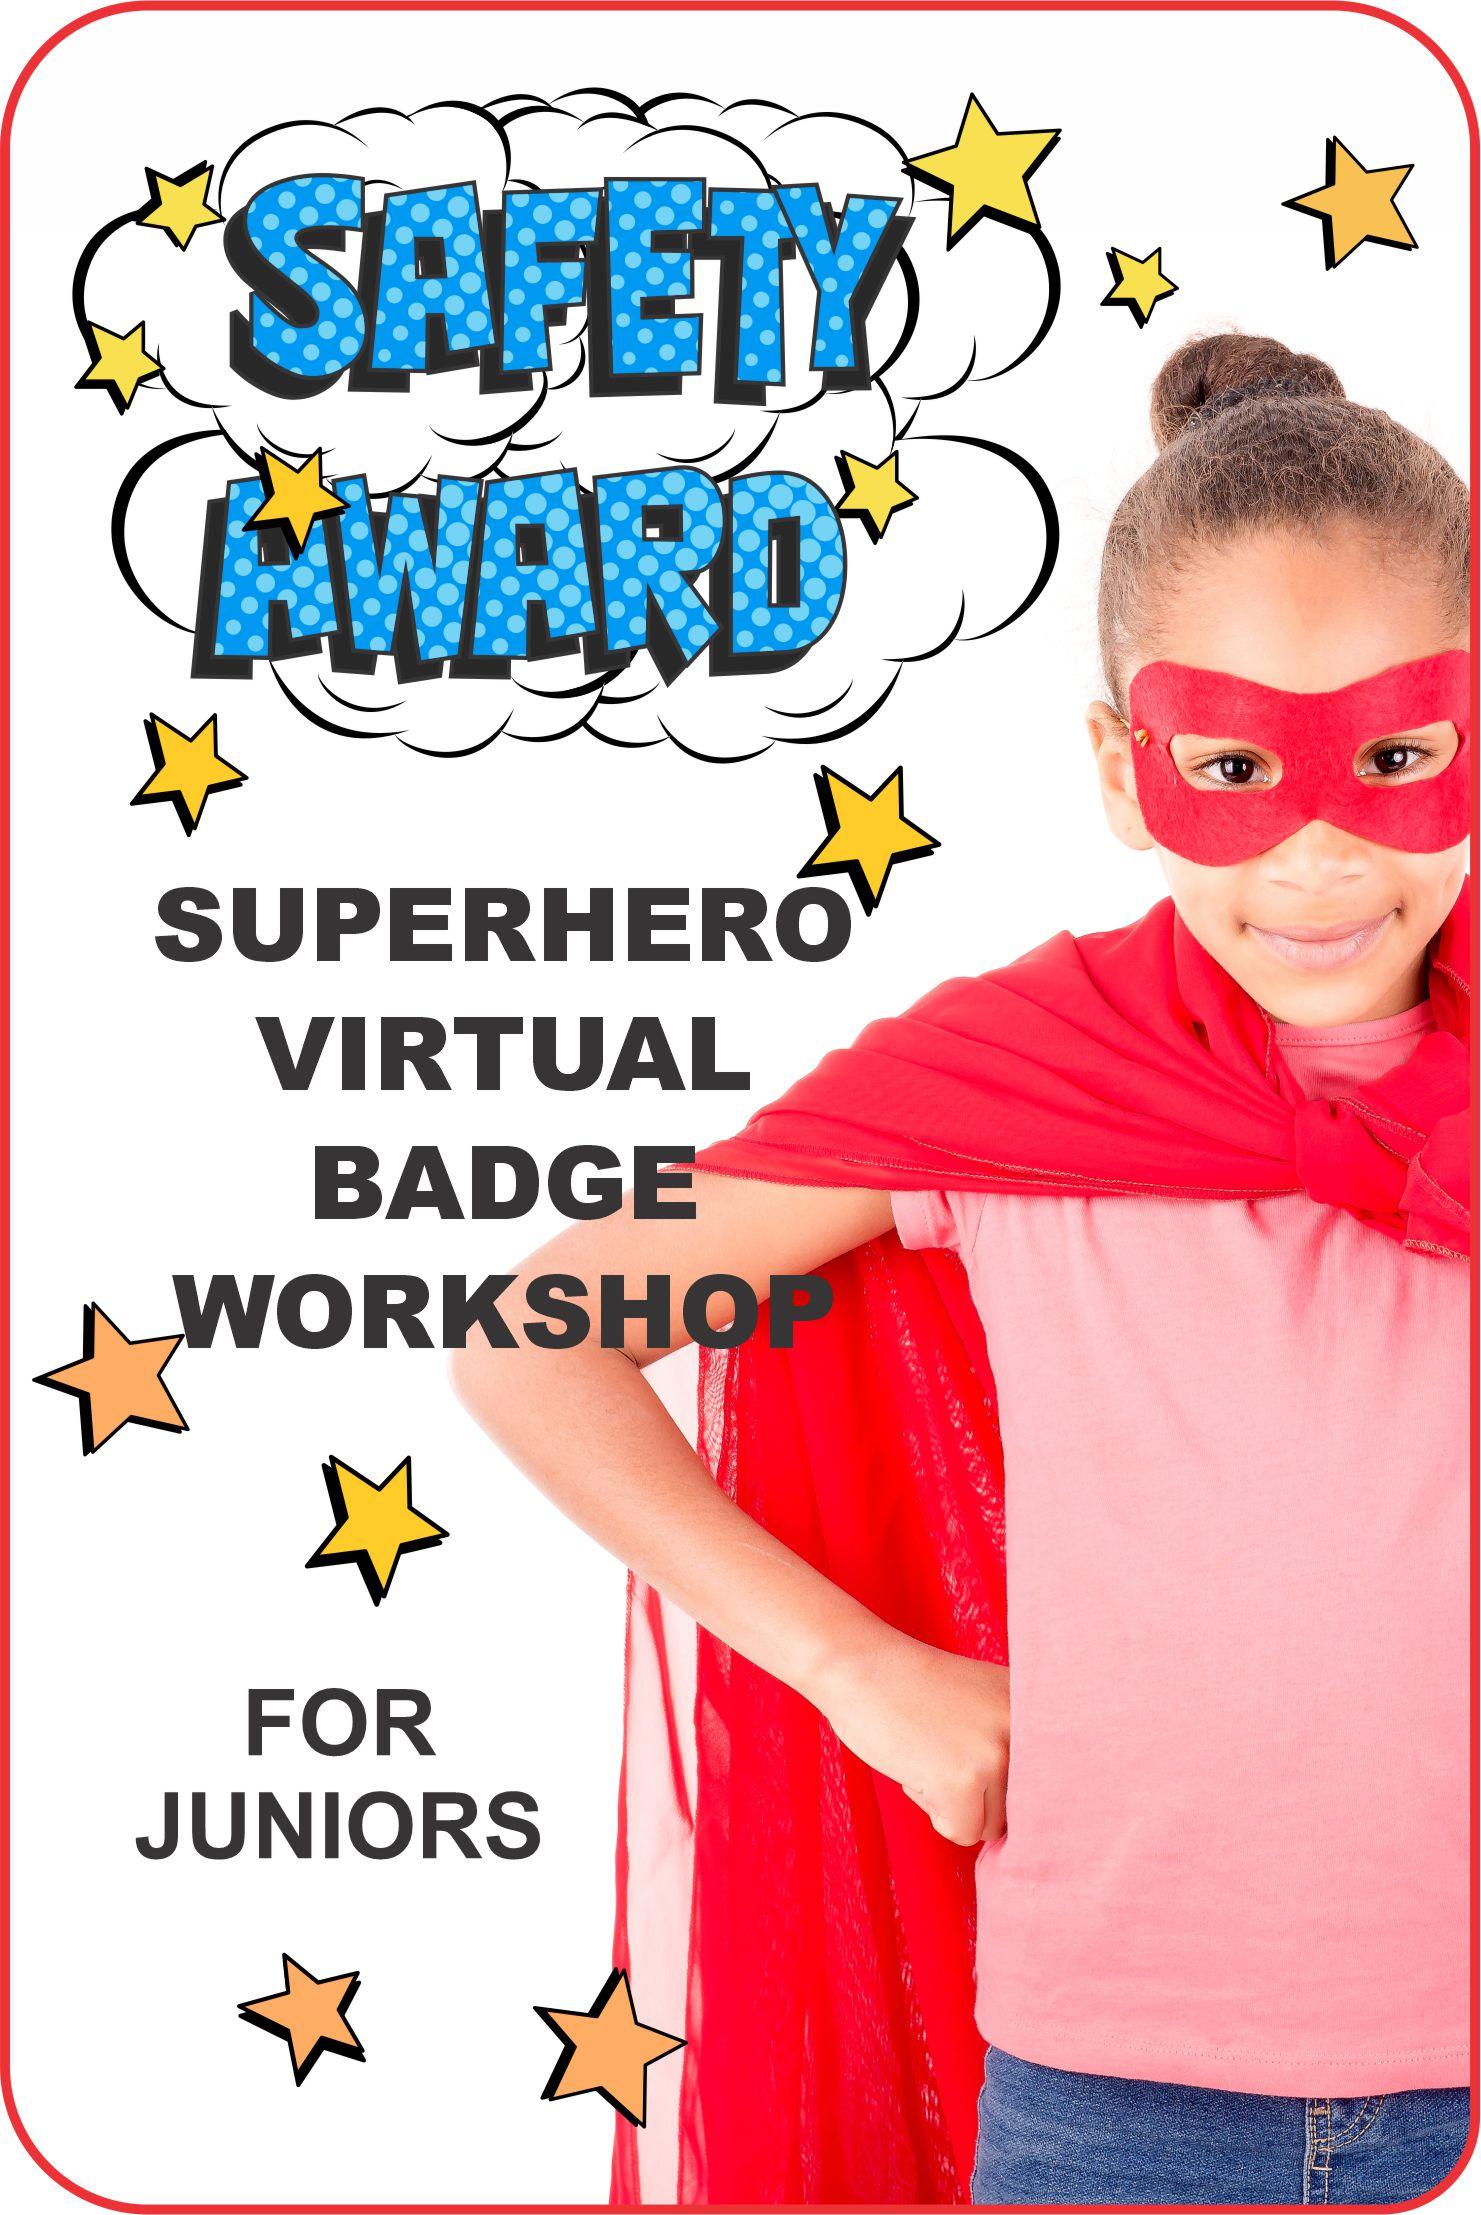 Come dressed like a superhero and join Superheroes Nichole and Justice for our Juniors Safety Award Workshop on Zoom!#makingfriends #virtual #safetyaward #safety #virutalworkshop #onlineclass #girlscouts #juniors #superhero #girlscoutworkshop #funpatch via @gsleader411